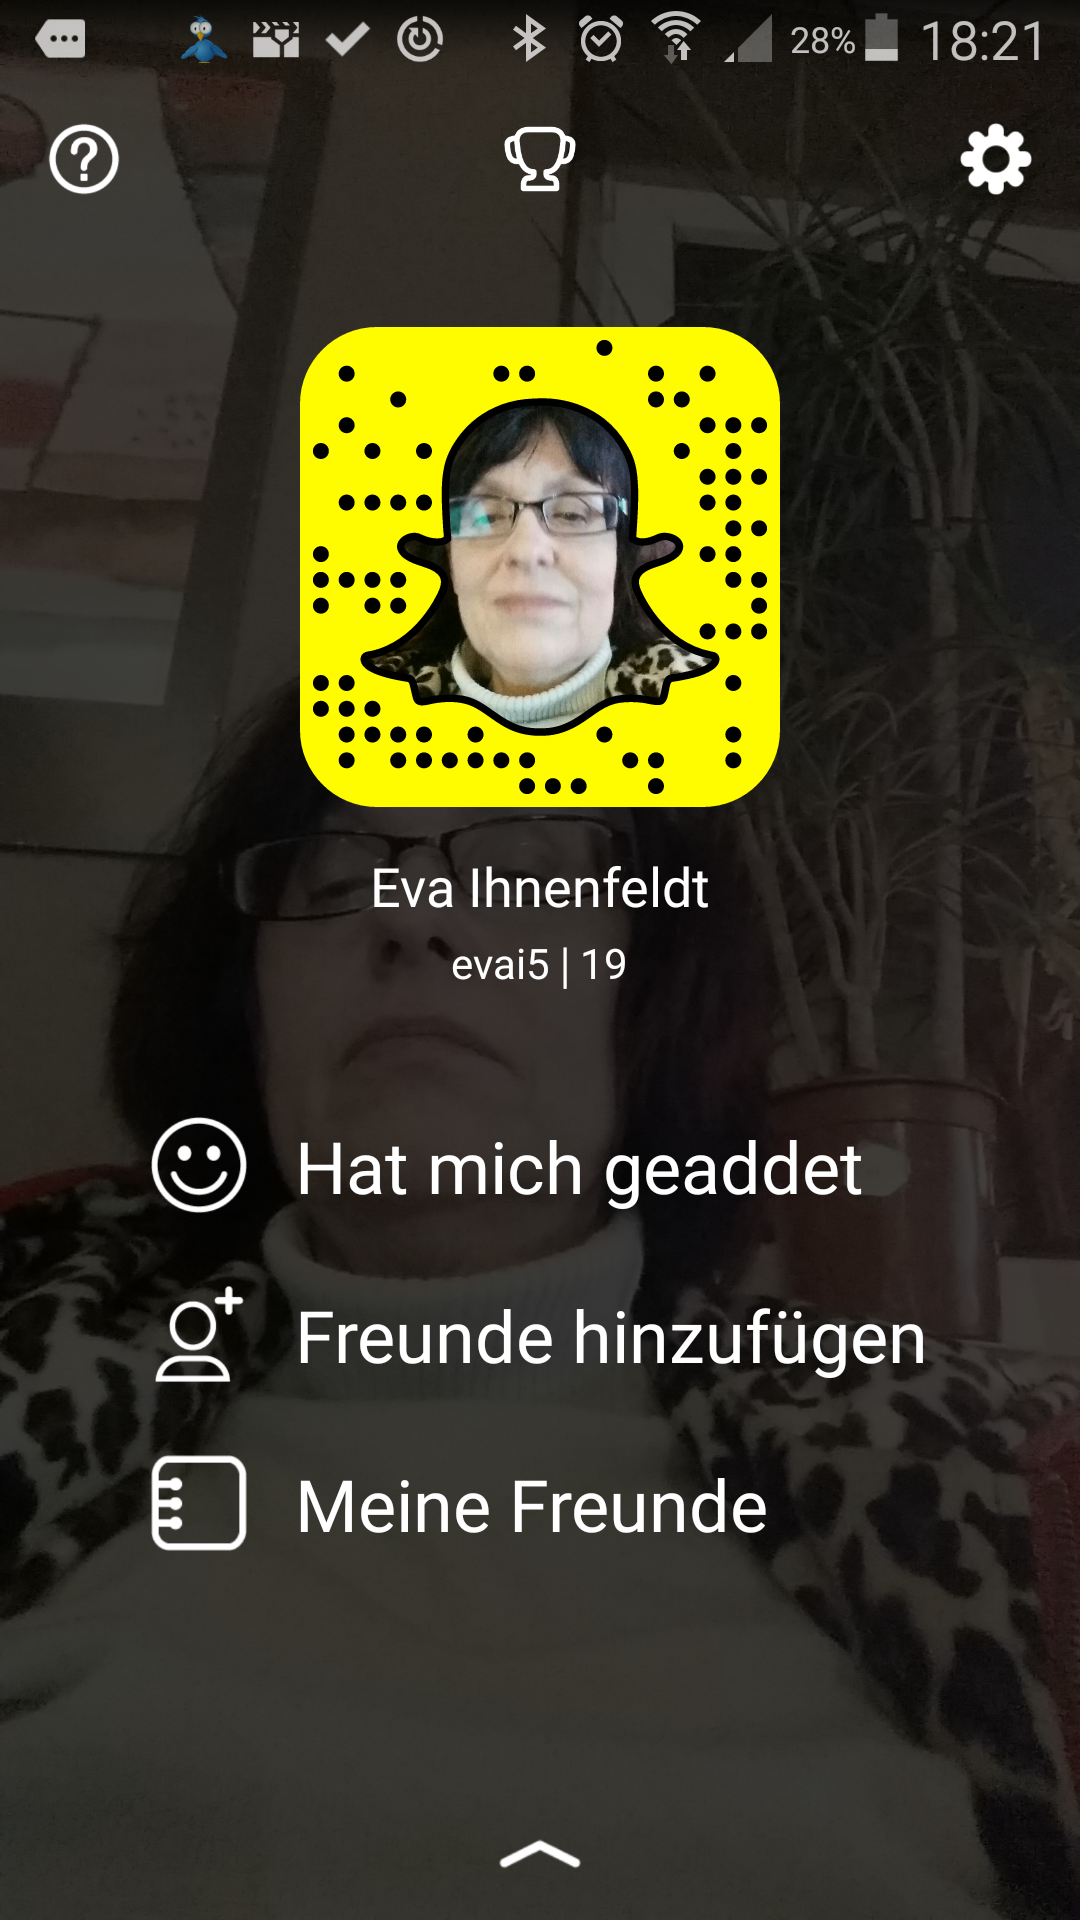 Eva Ihnenfeldt bei Snapchat - aber nicht aktiv